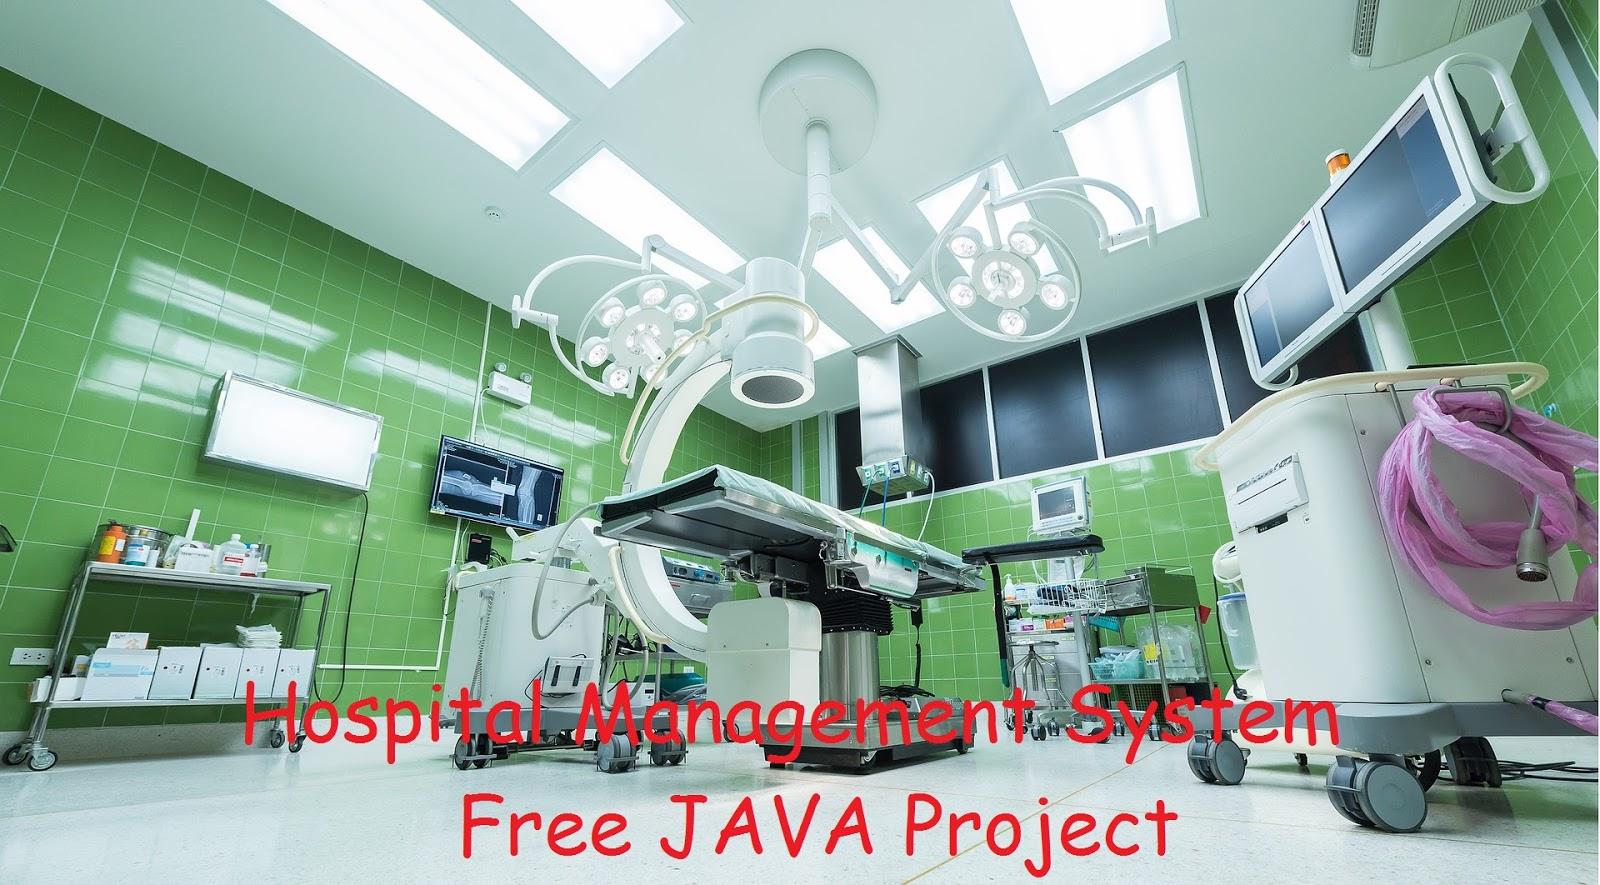 Hospital Management System Free JAVA Project